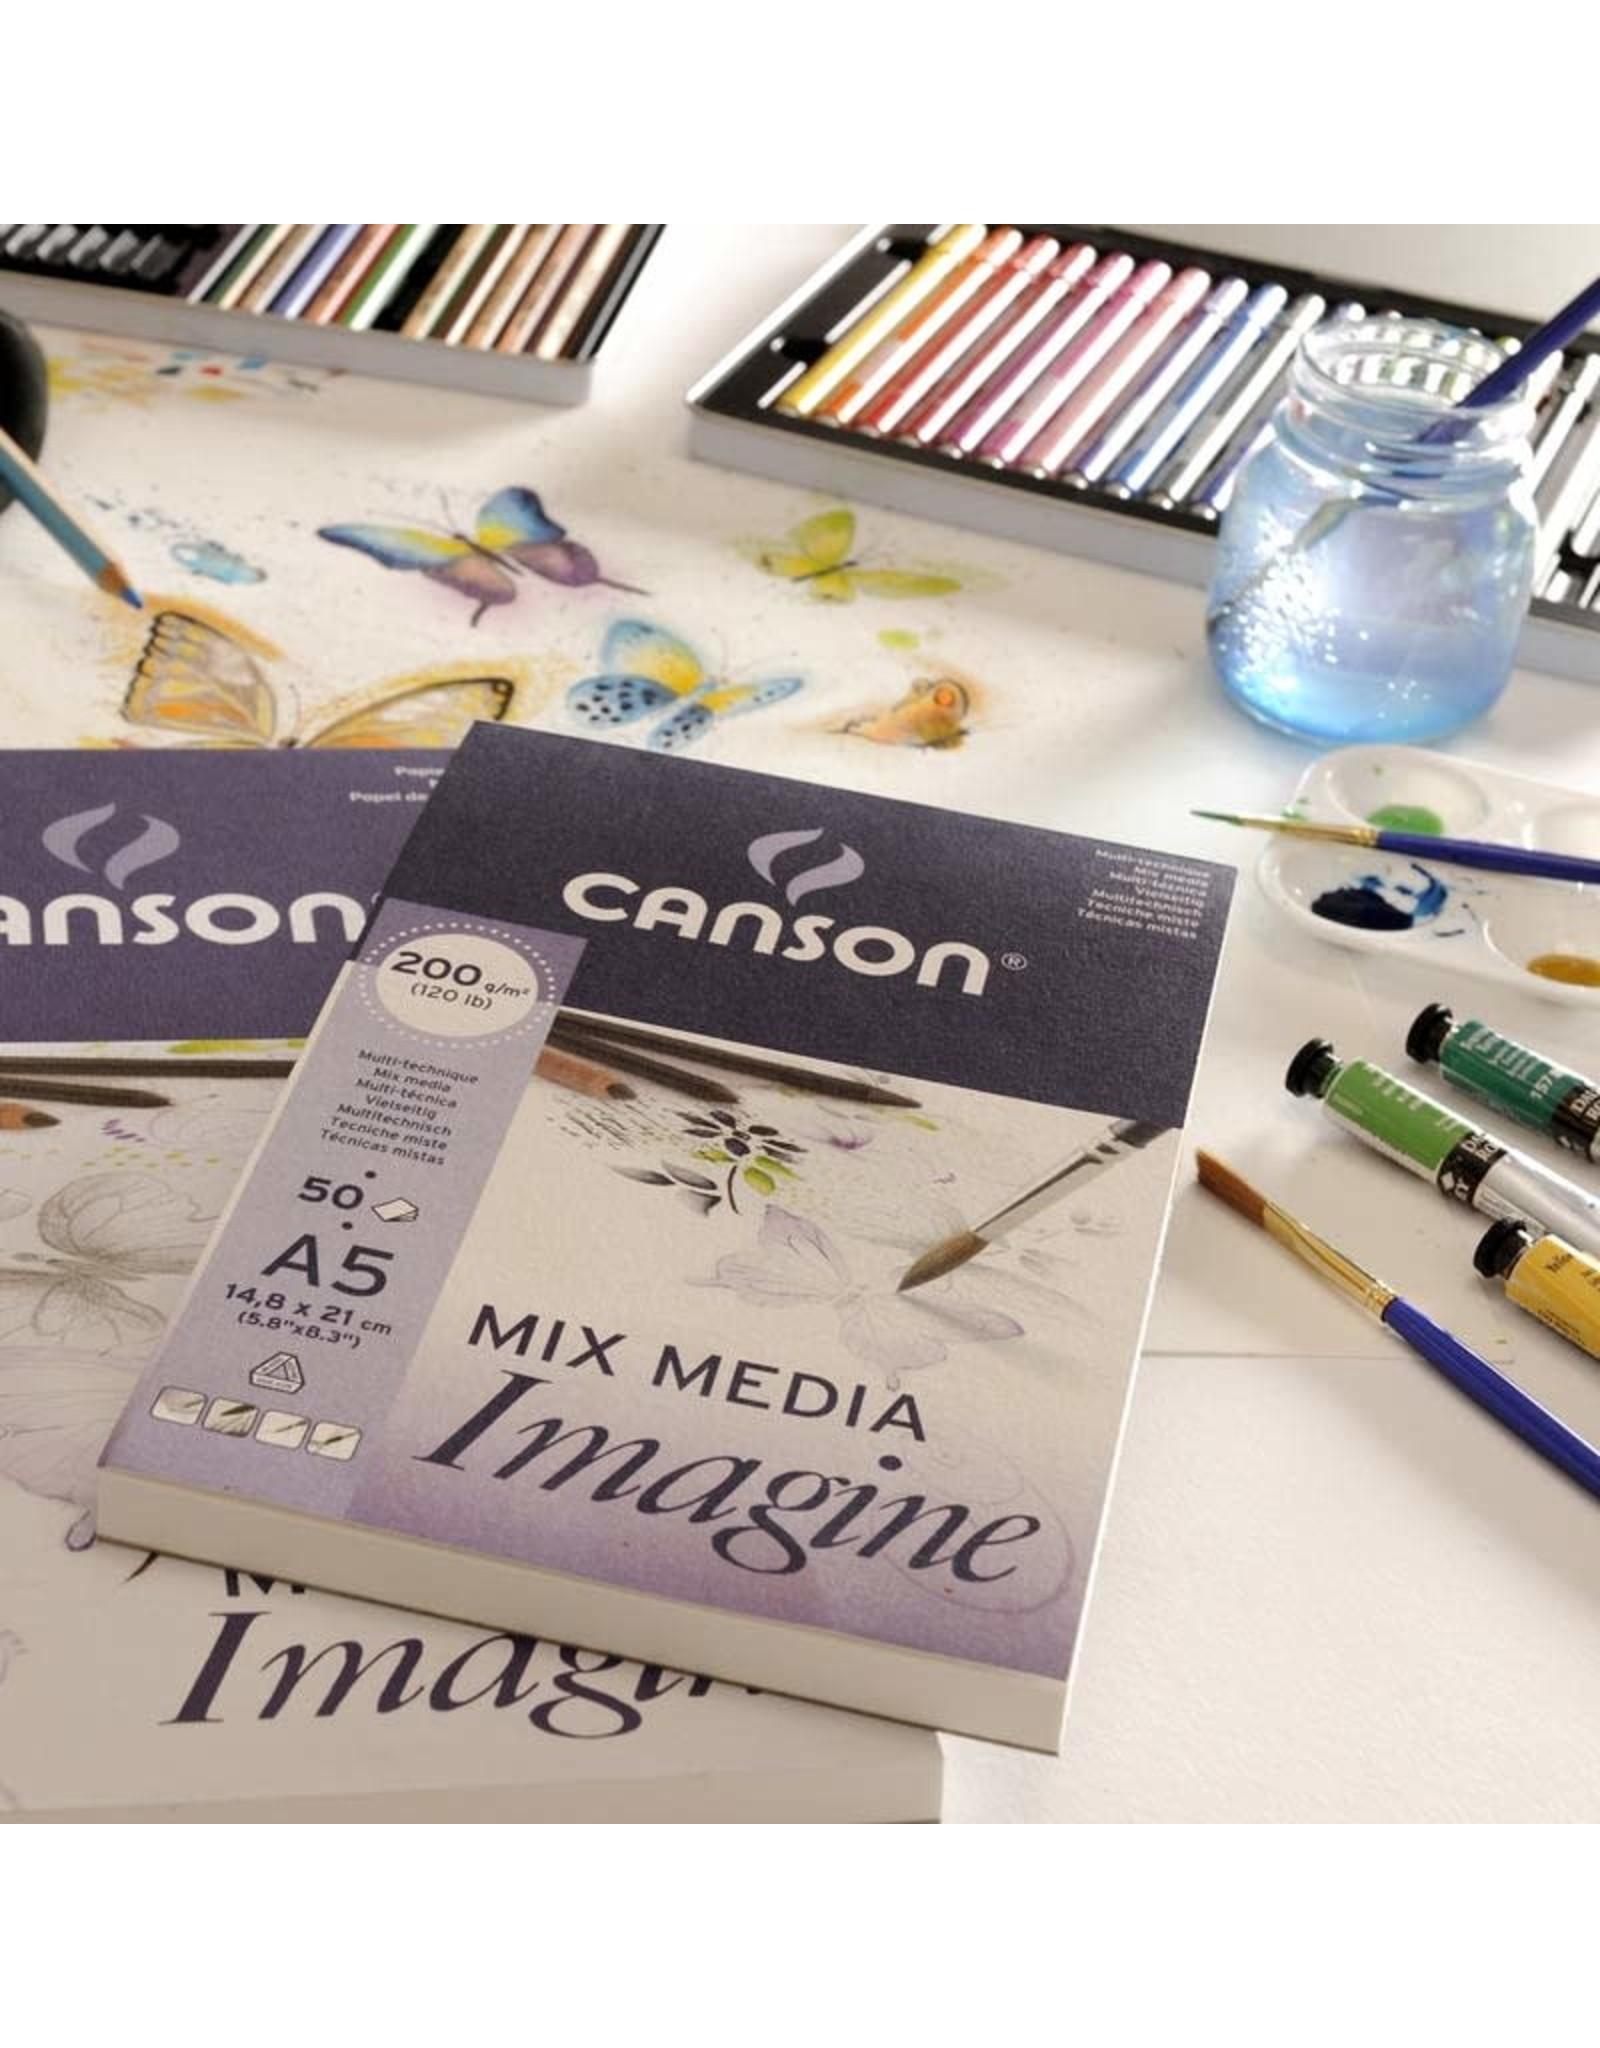 Canson Mix media imagine A5 200gr 50 vellen